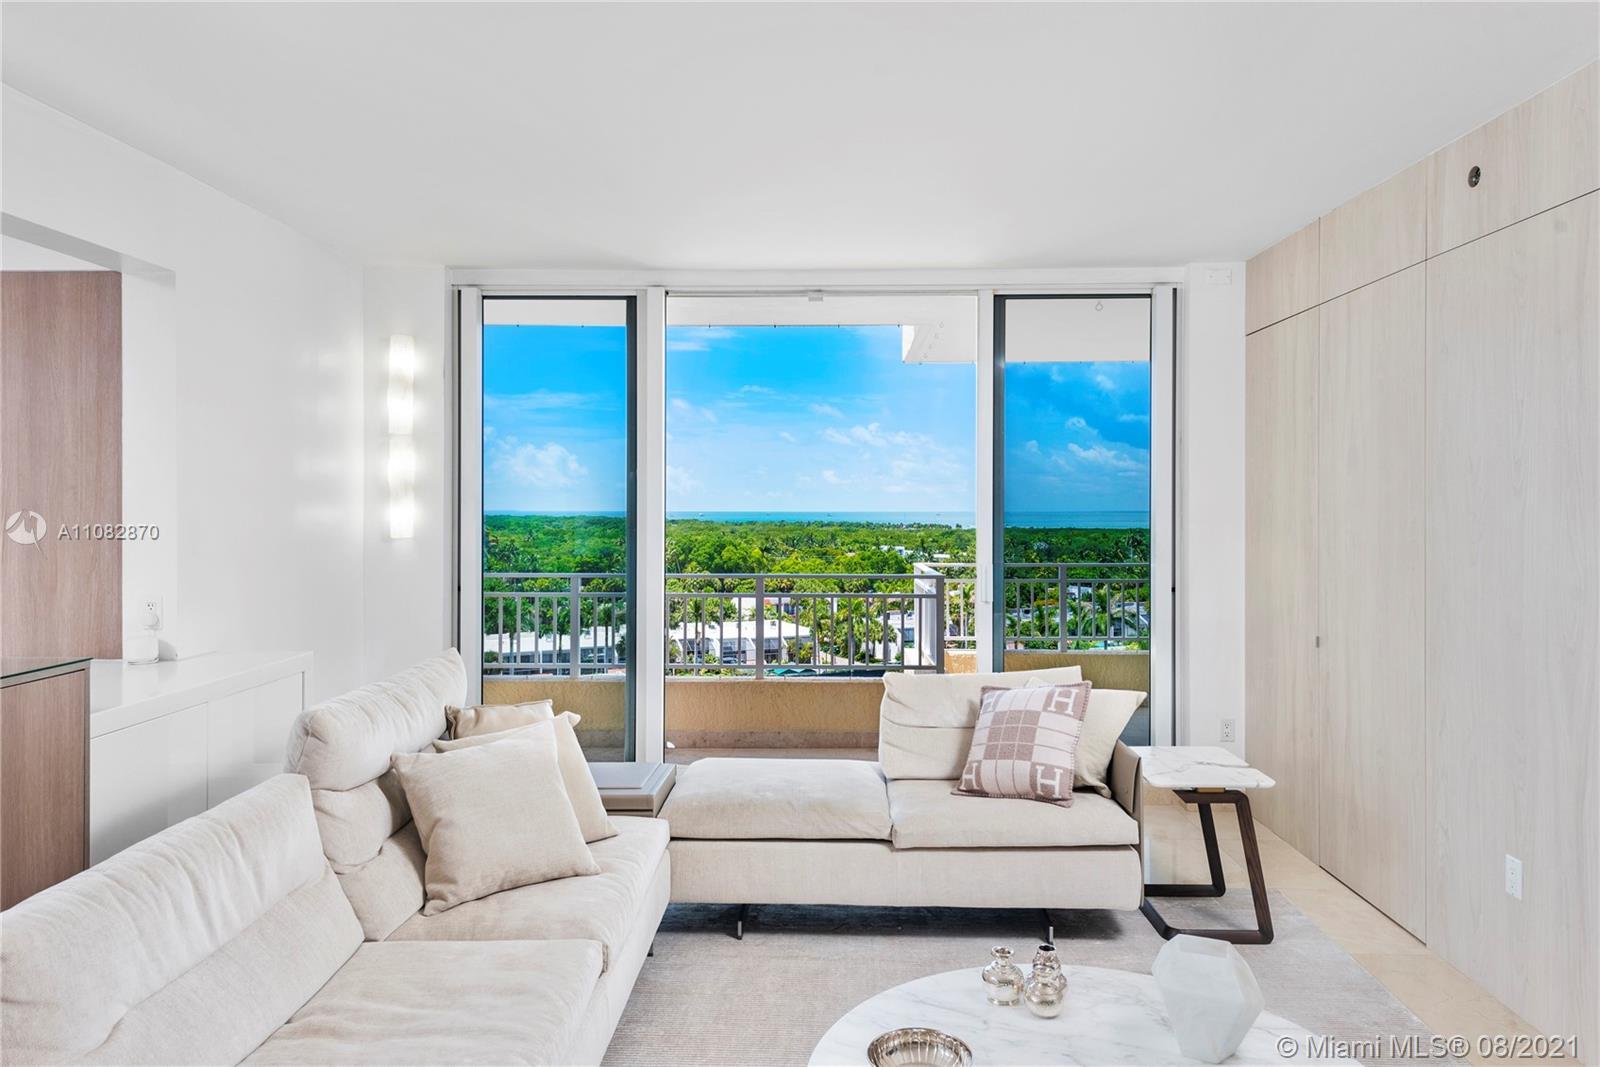 799 Crandon Blvd, Unit #802 Luxury Real Estate